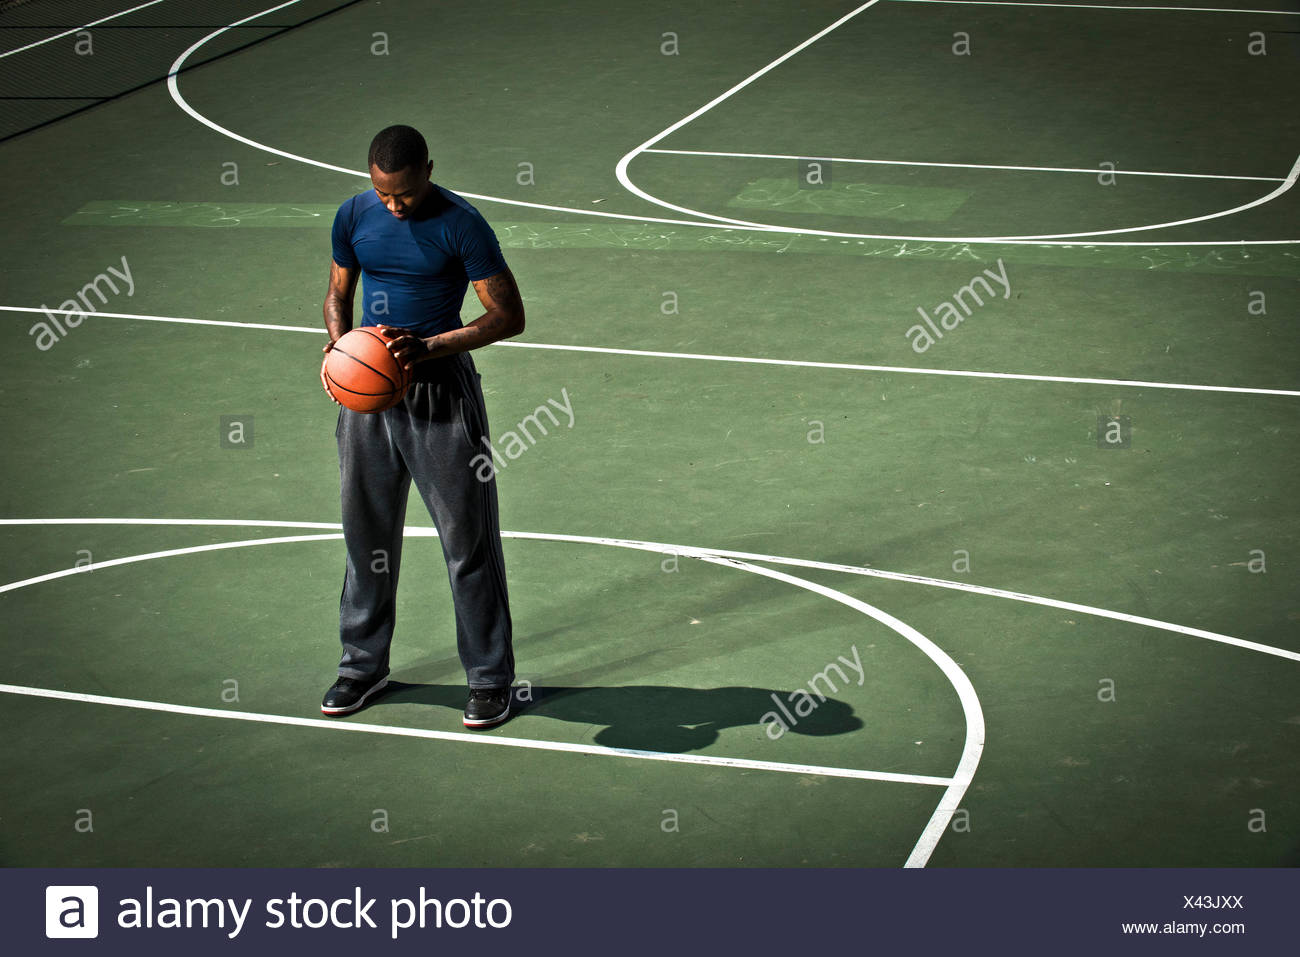 Eine Basketballspieler Praktiken Freiwürfe. Stockbild